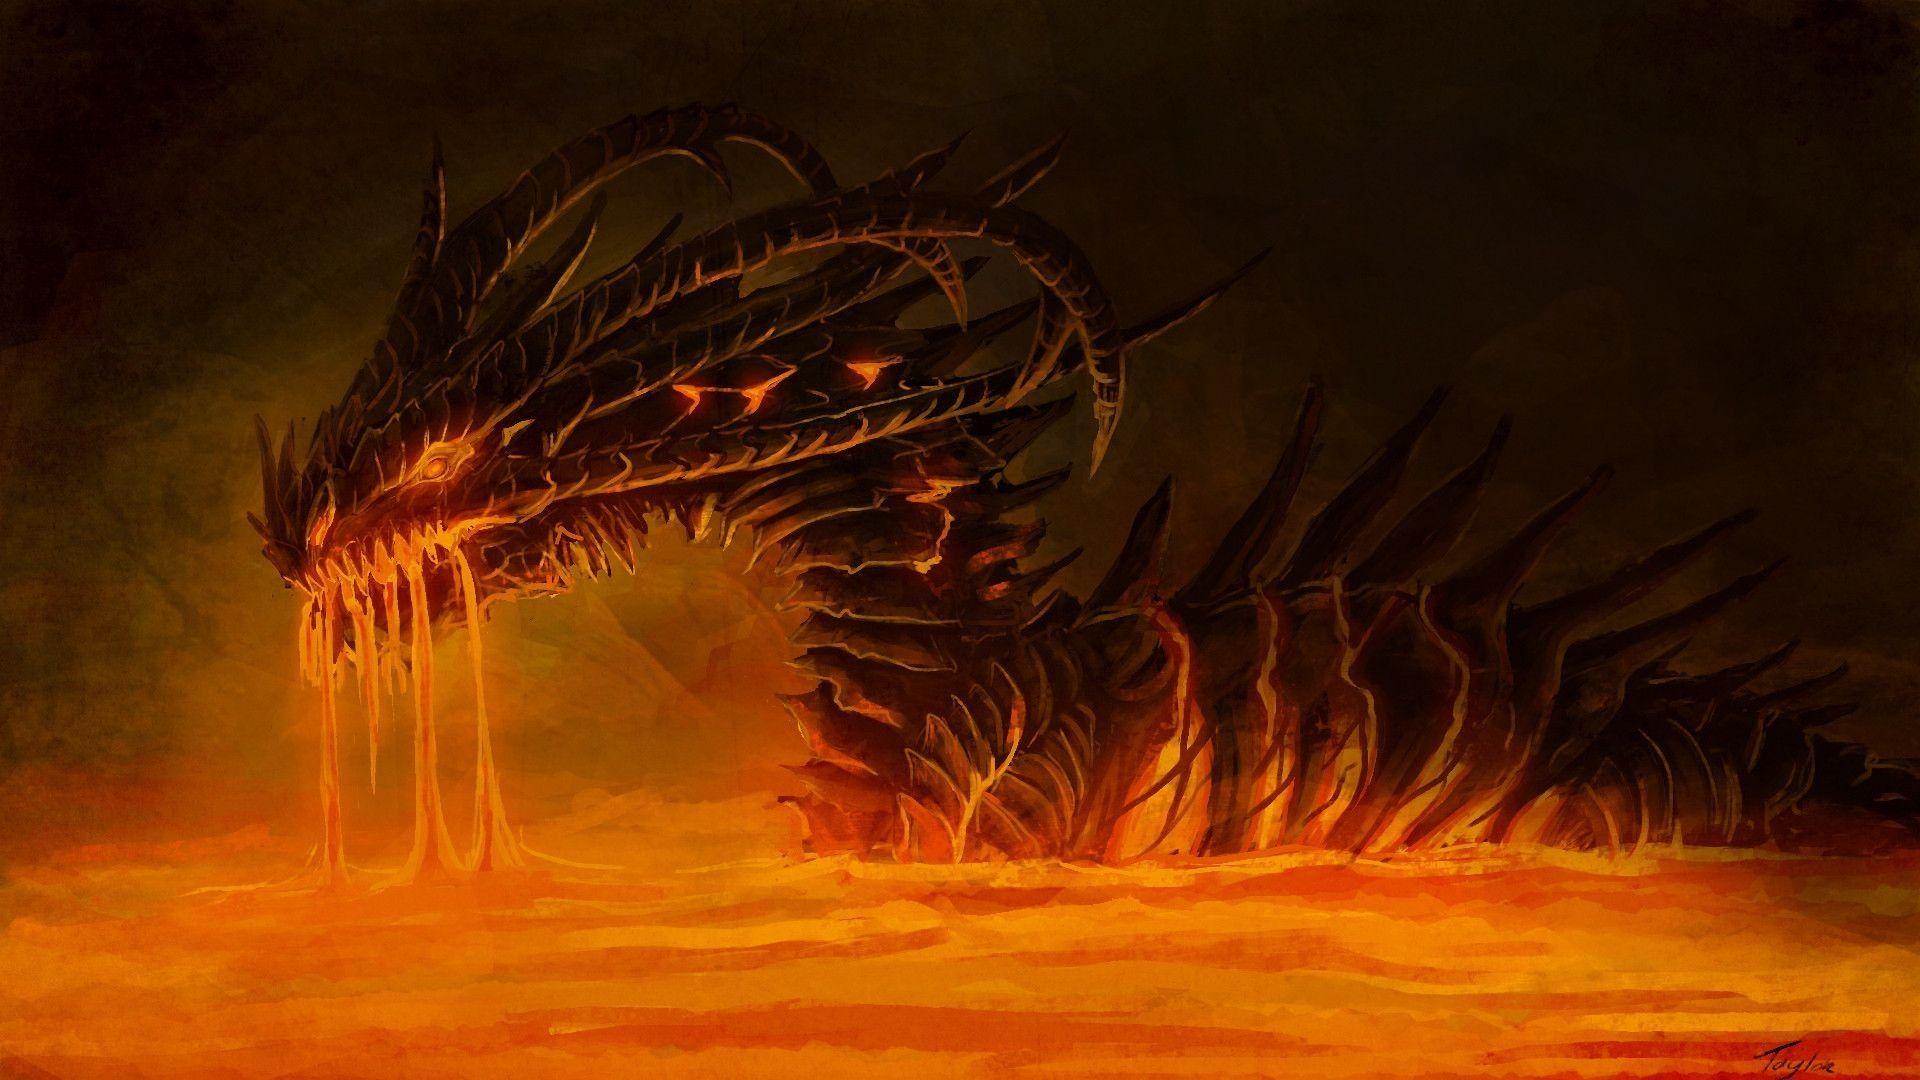 scary dragon wallpaper